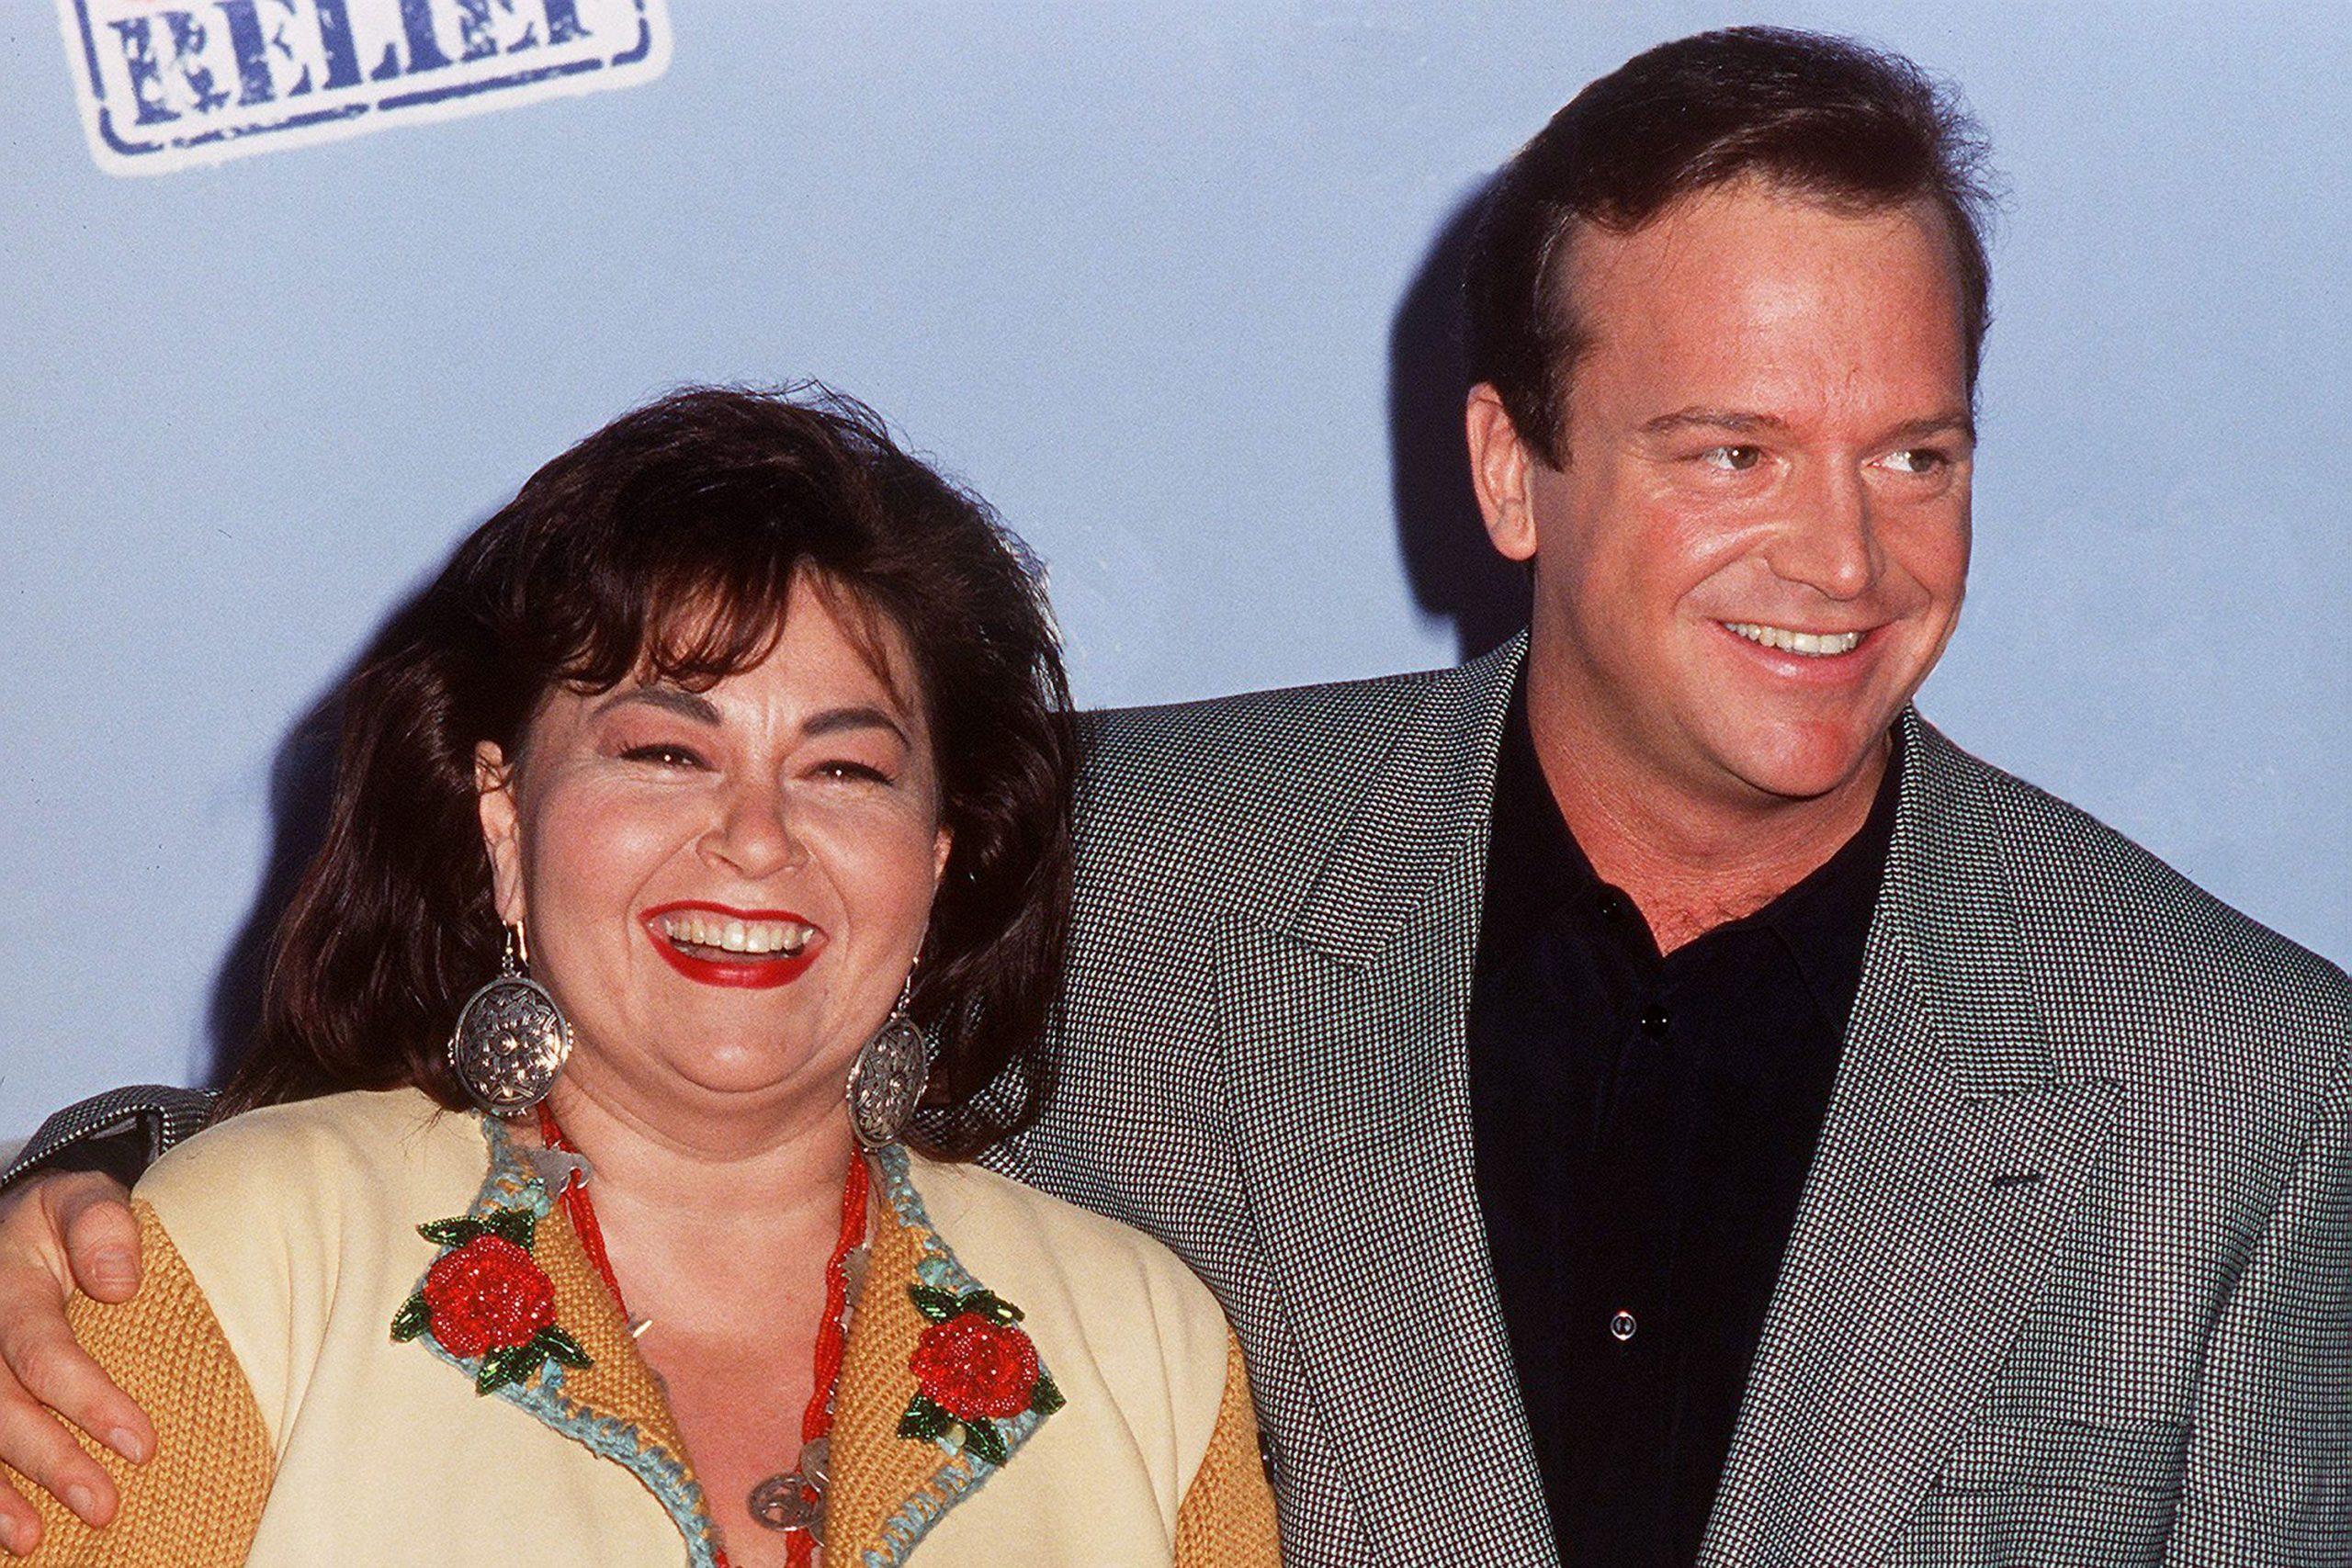 Roseanne Barr And Tom Arnold Split She Cut Up Tom's Credit Cards?